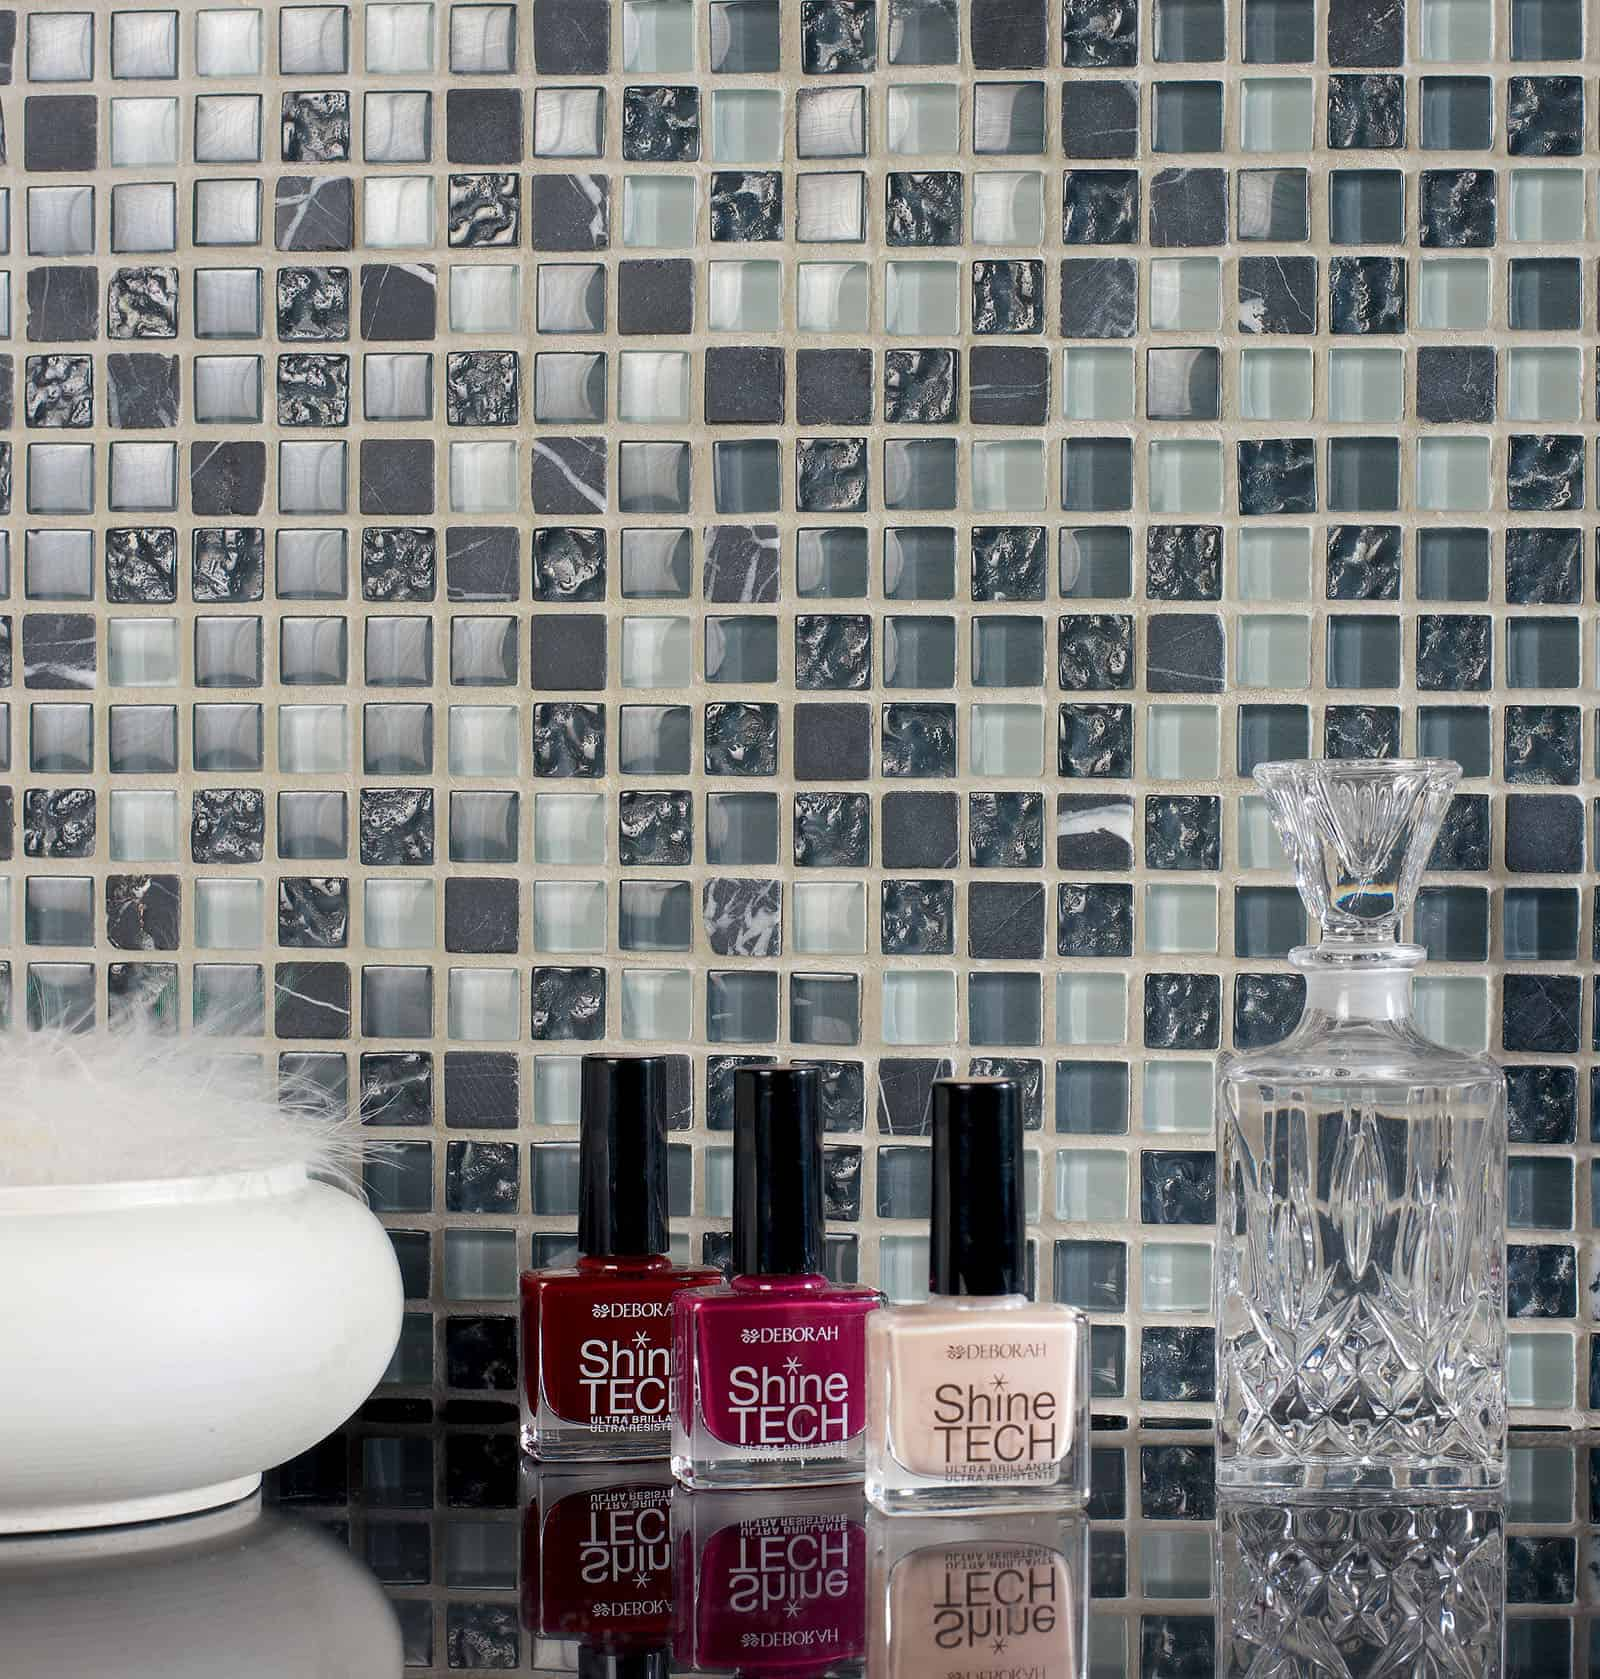 Serie baie pavimenti e rivestimenti armonie ceramiche for Paraschizzi cucina mosaico